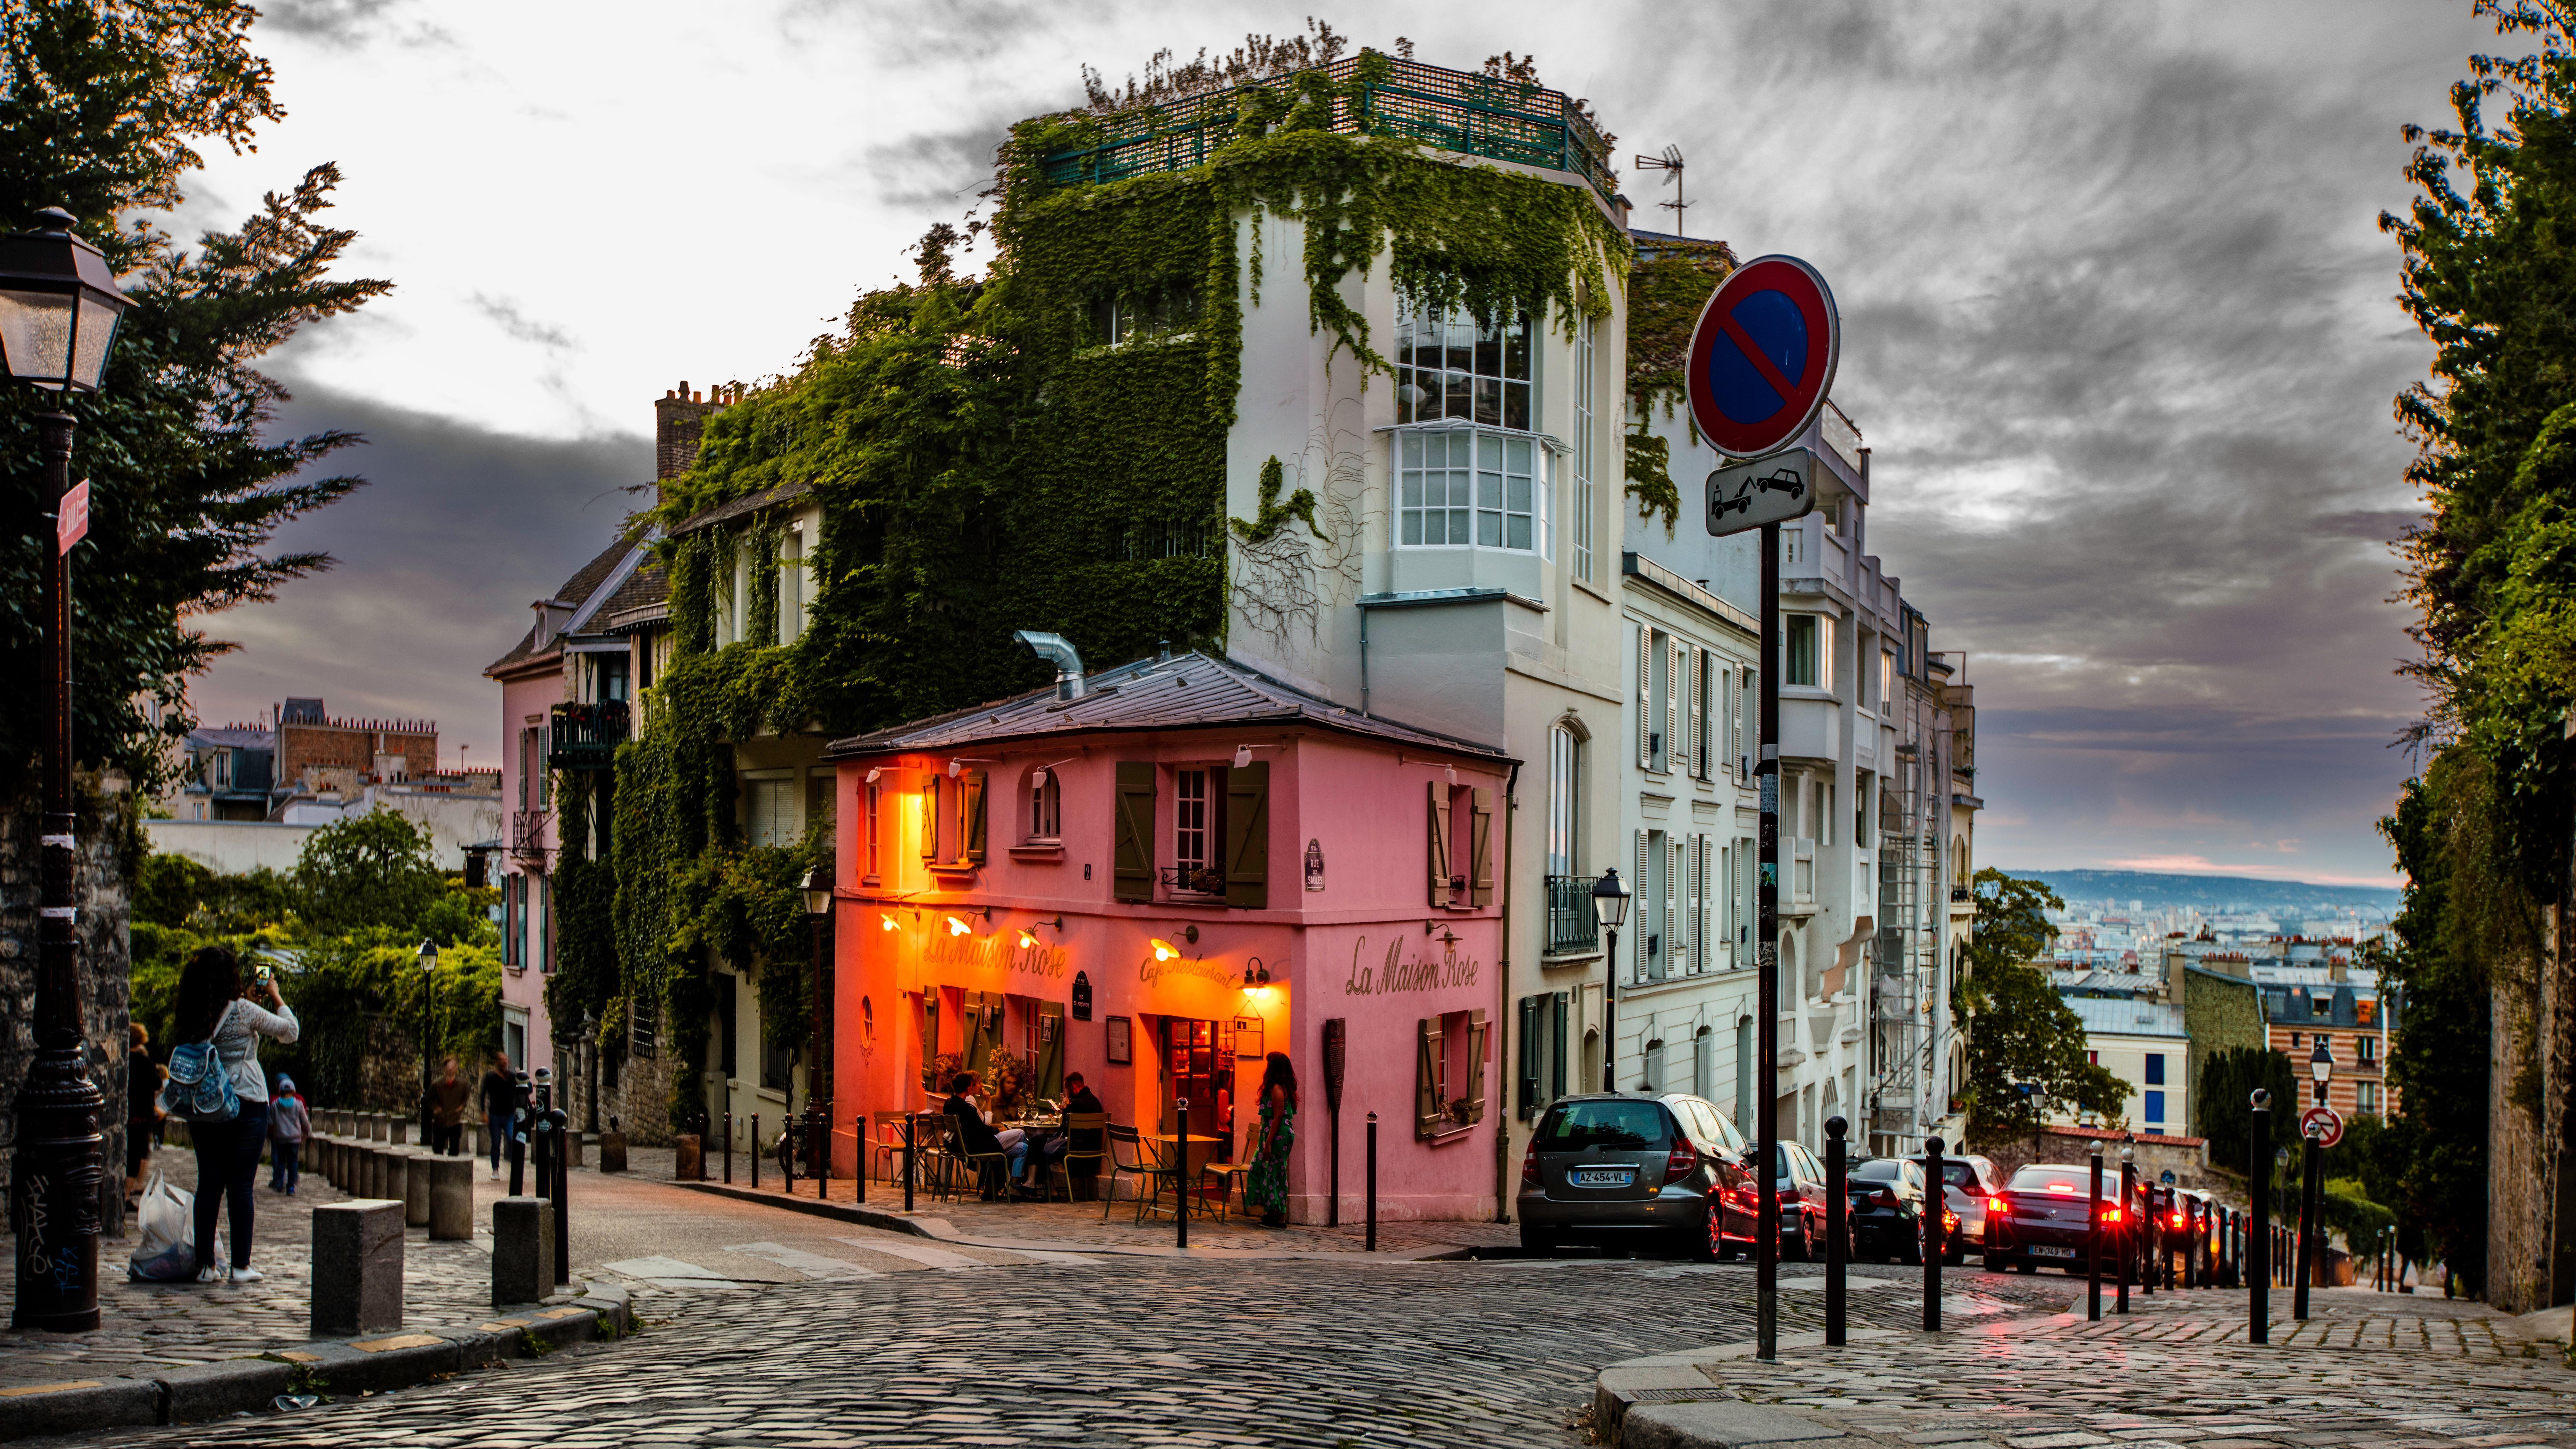 Restaurant In Paris 8k Ultra Hd Wallpaper Background Image